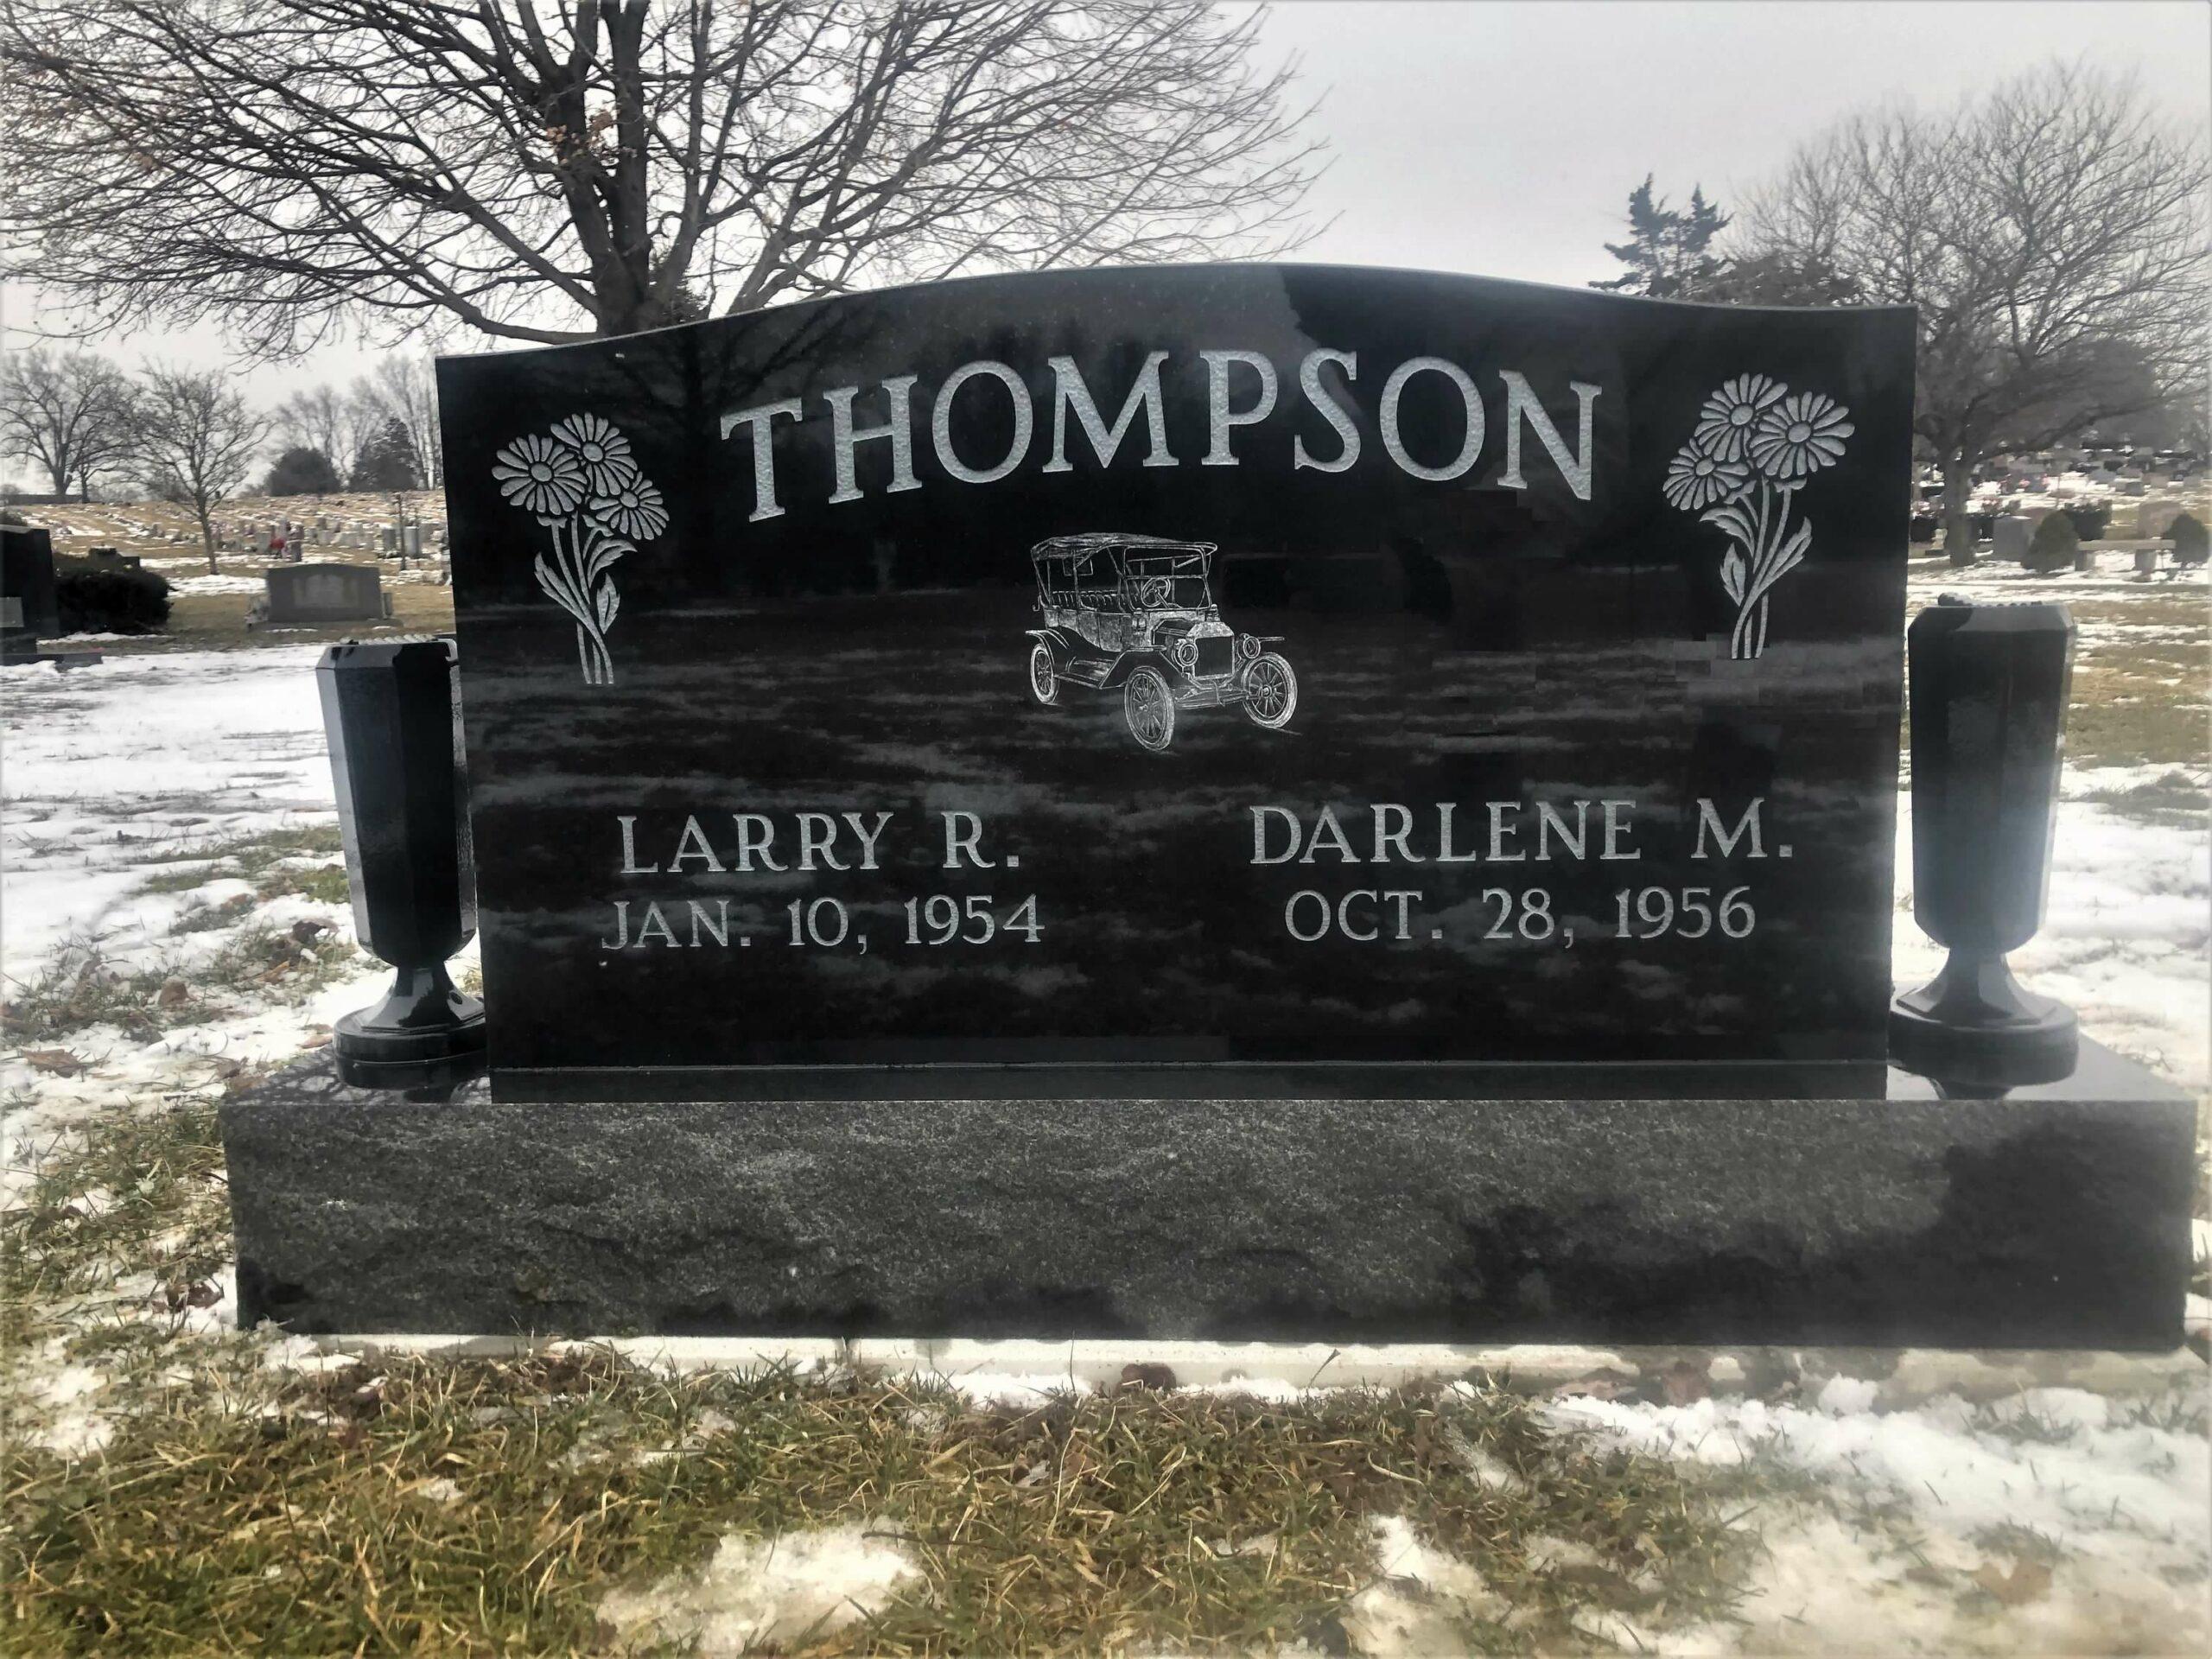 Thompson, Larry